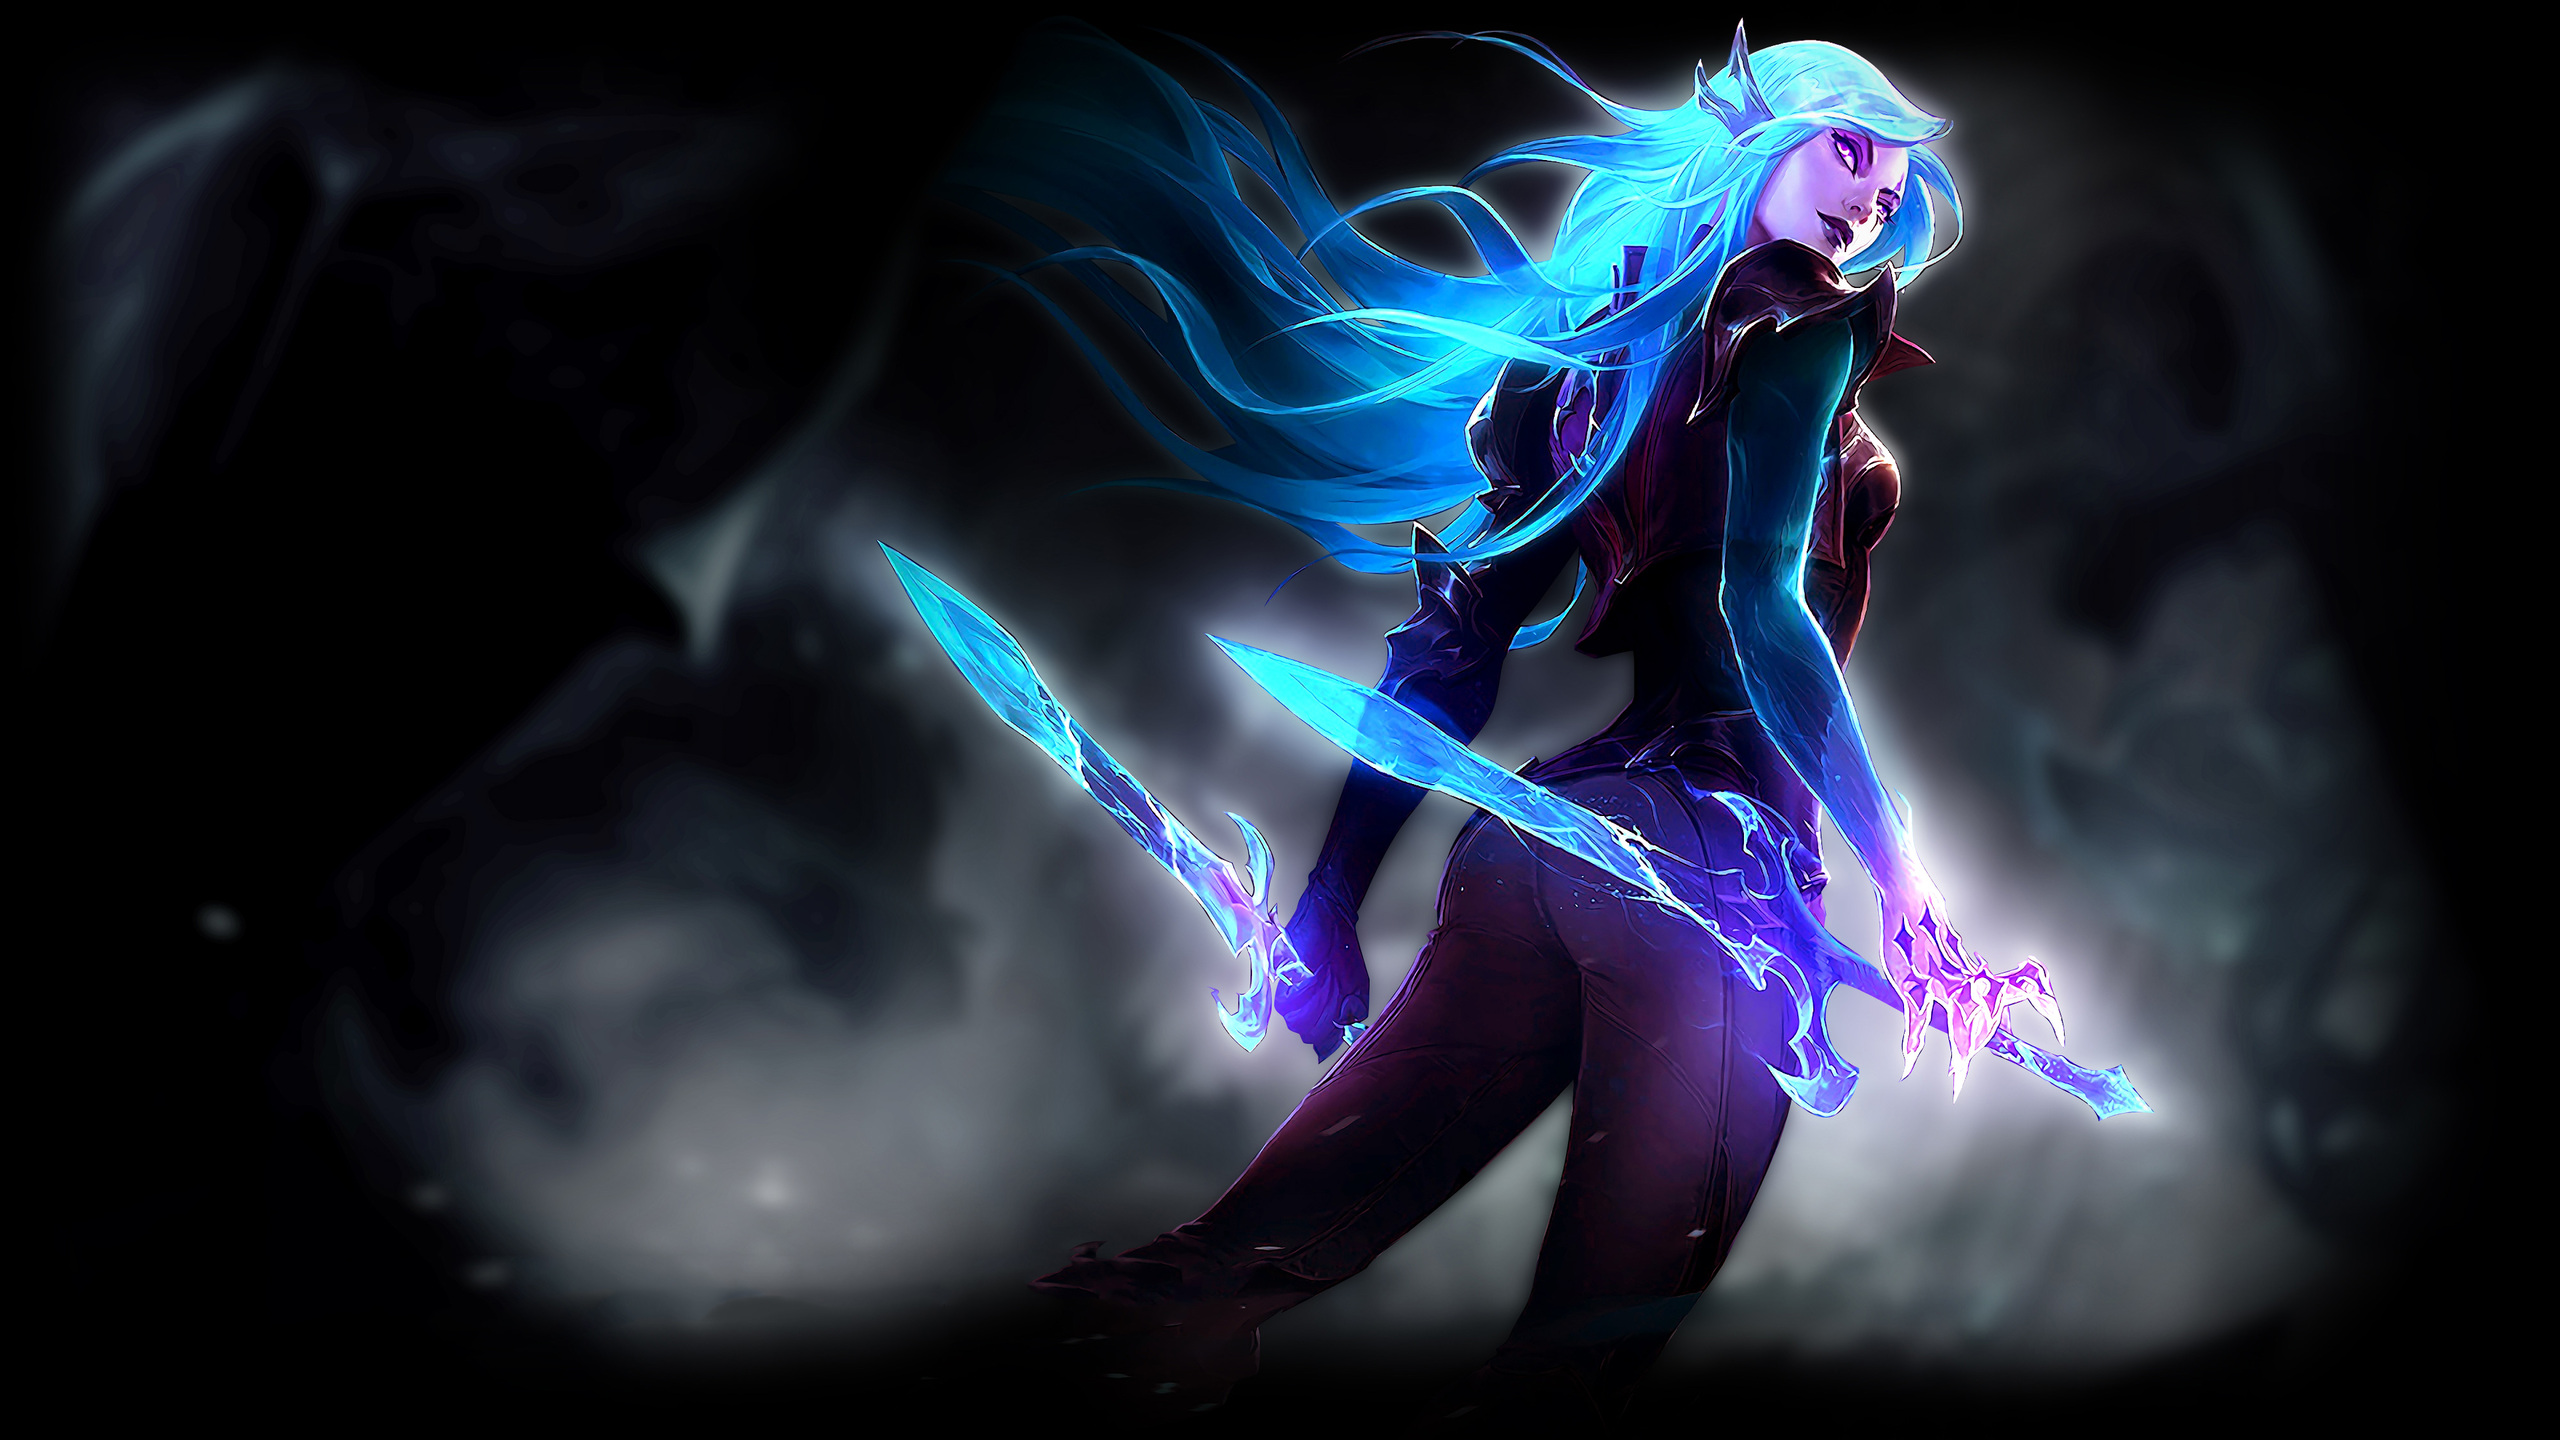 2560x1440 Death Sworn Katarina League Of Legends 1440p Resolution